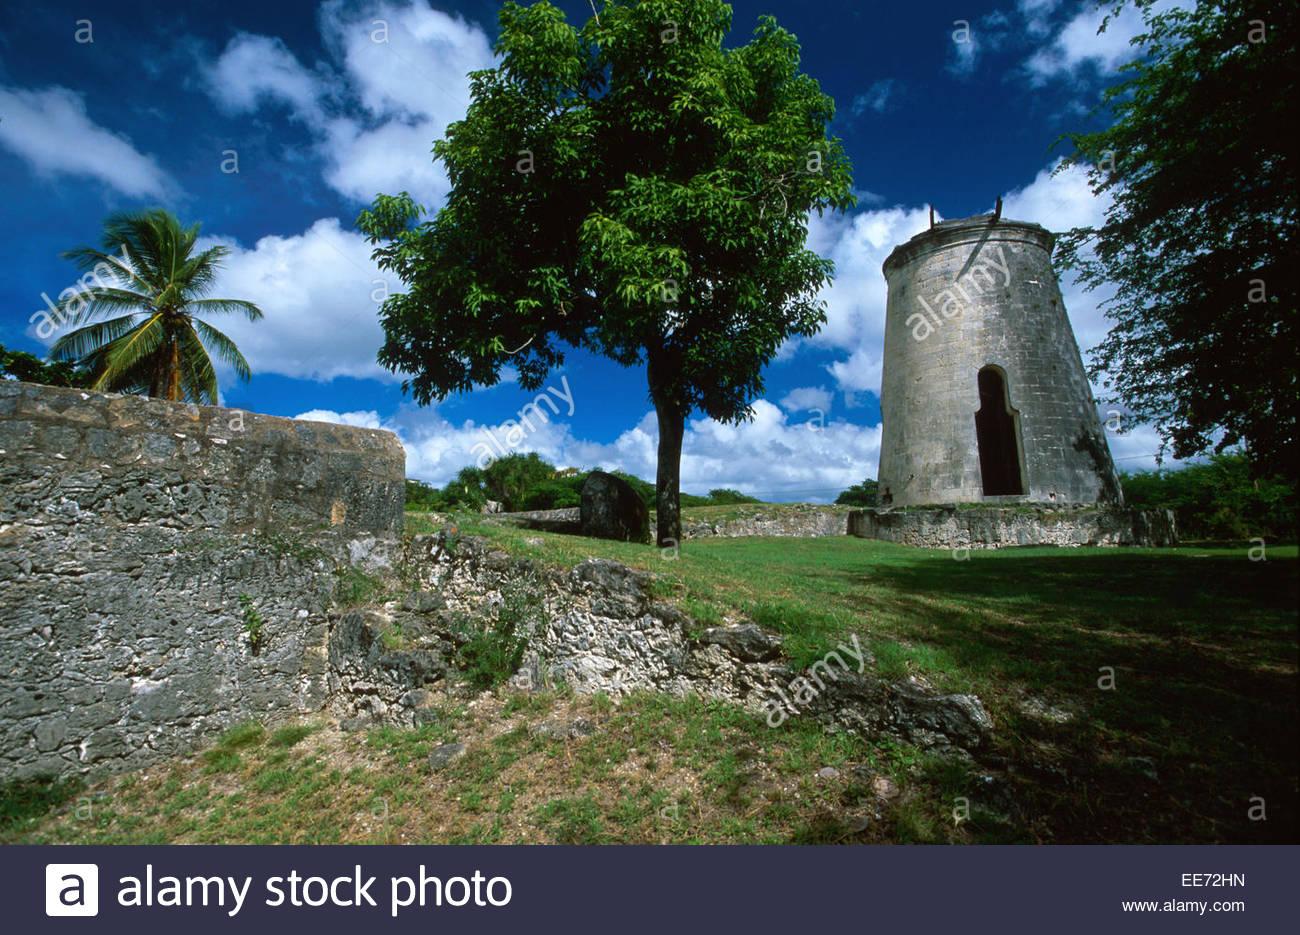 Guadeloupe, Marie galante, Murat house - Stock Image